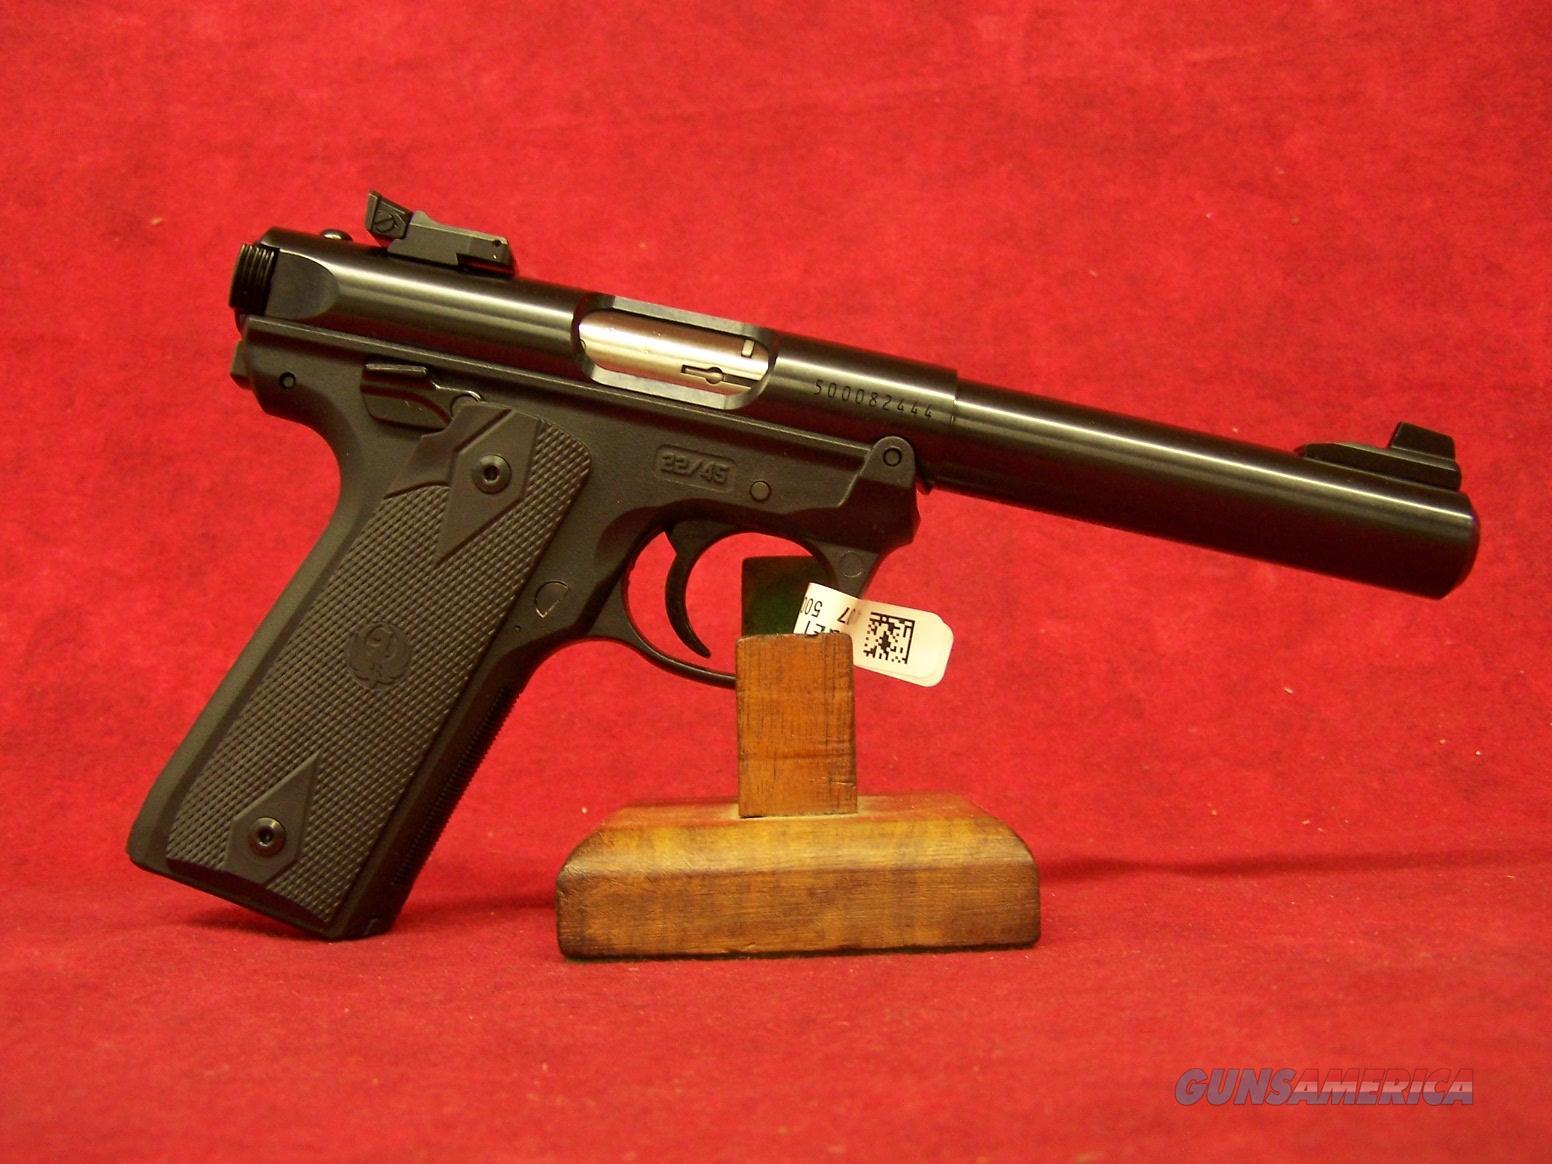 "Ruger Mark IV 22/45 Blued .22LR 5-1/2"" Barrel (40107)  Guns > Pistols > Ruger Semi-Auto Pistols > Mark I/II/III/IV Family"